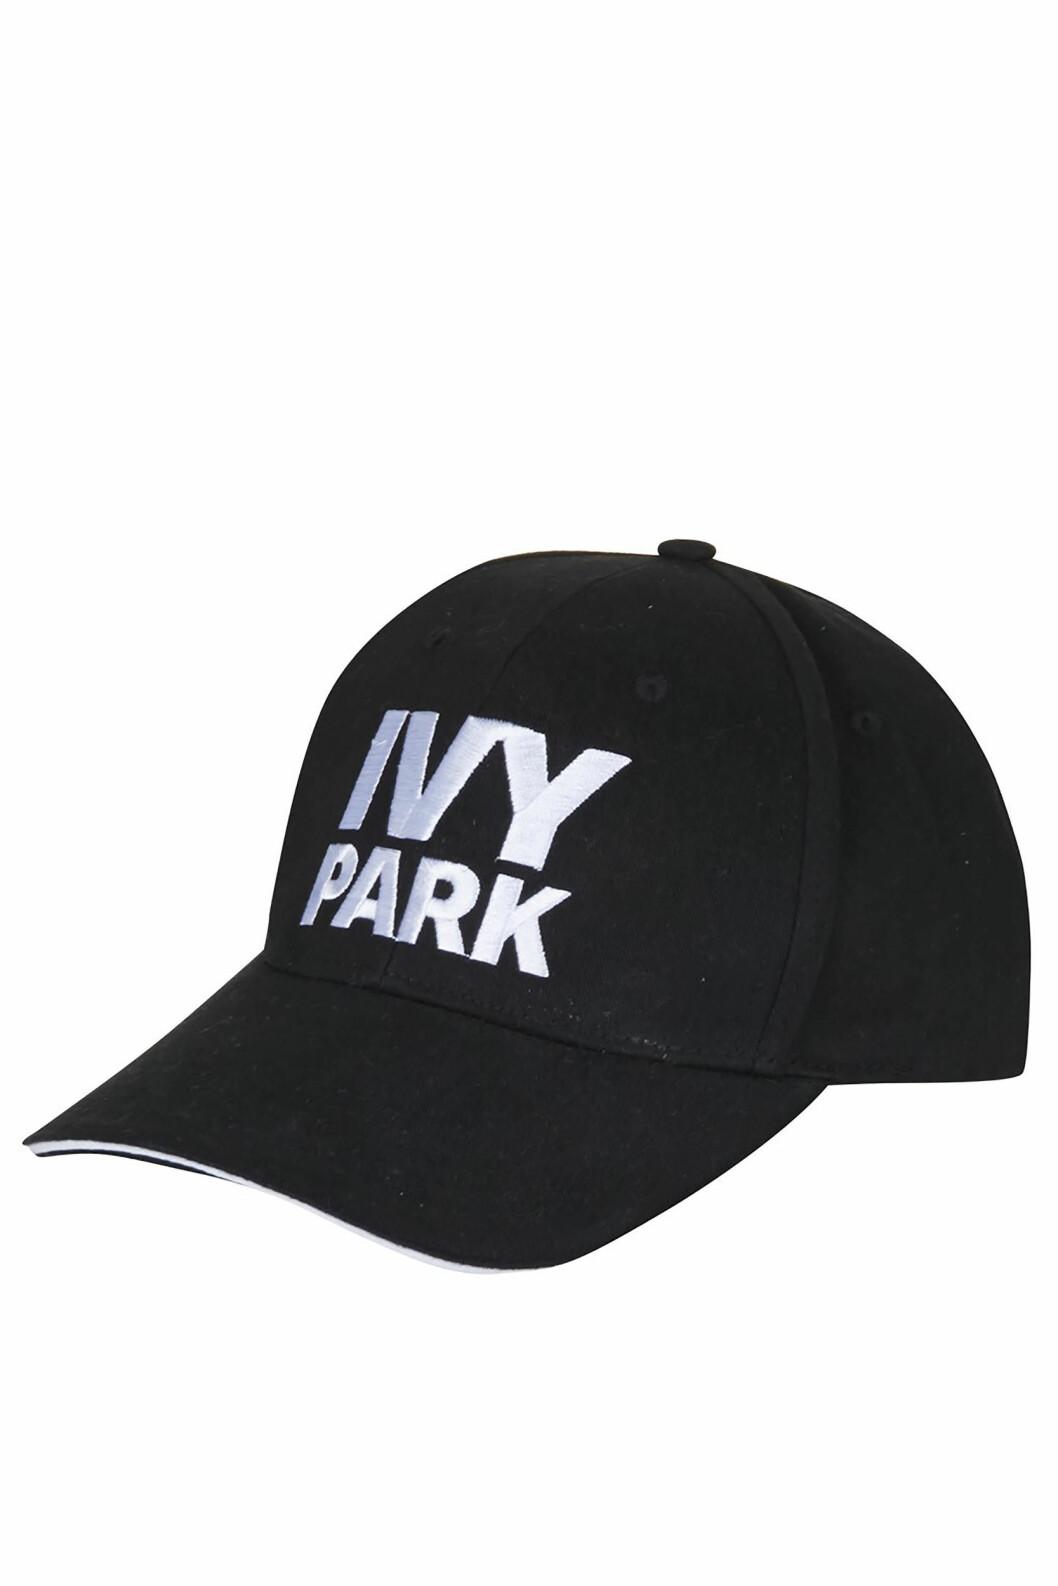 beyonce ivy park 60